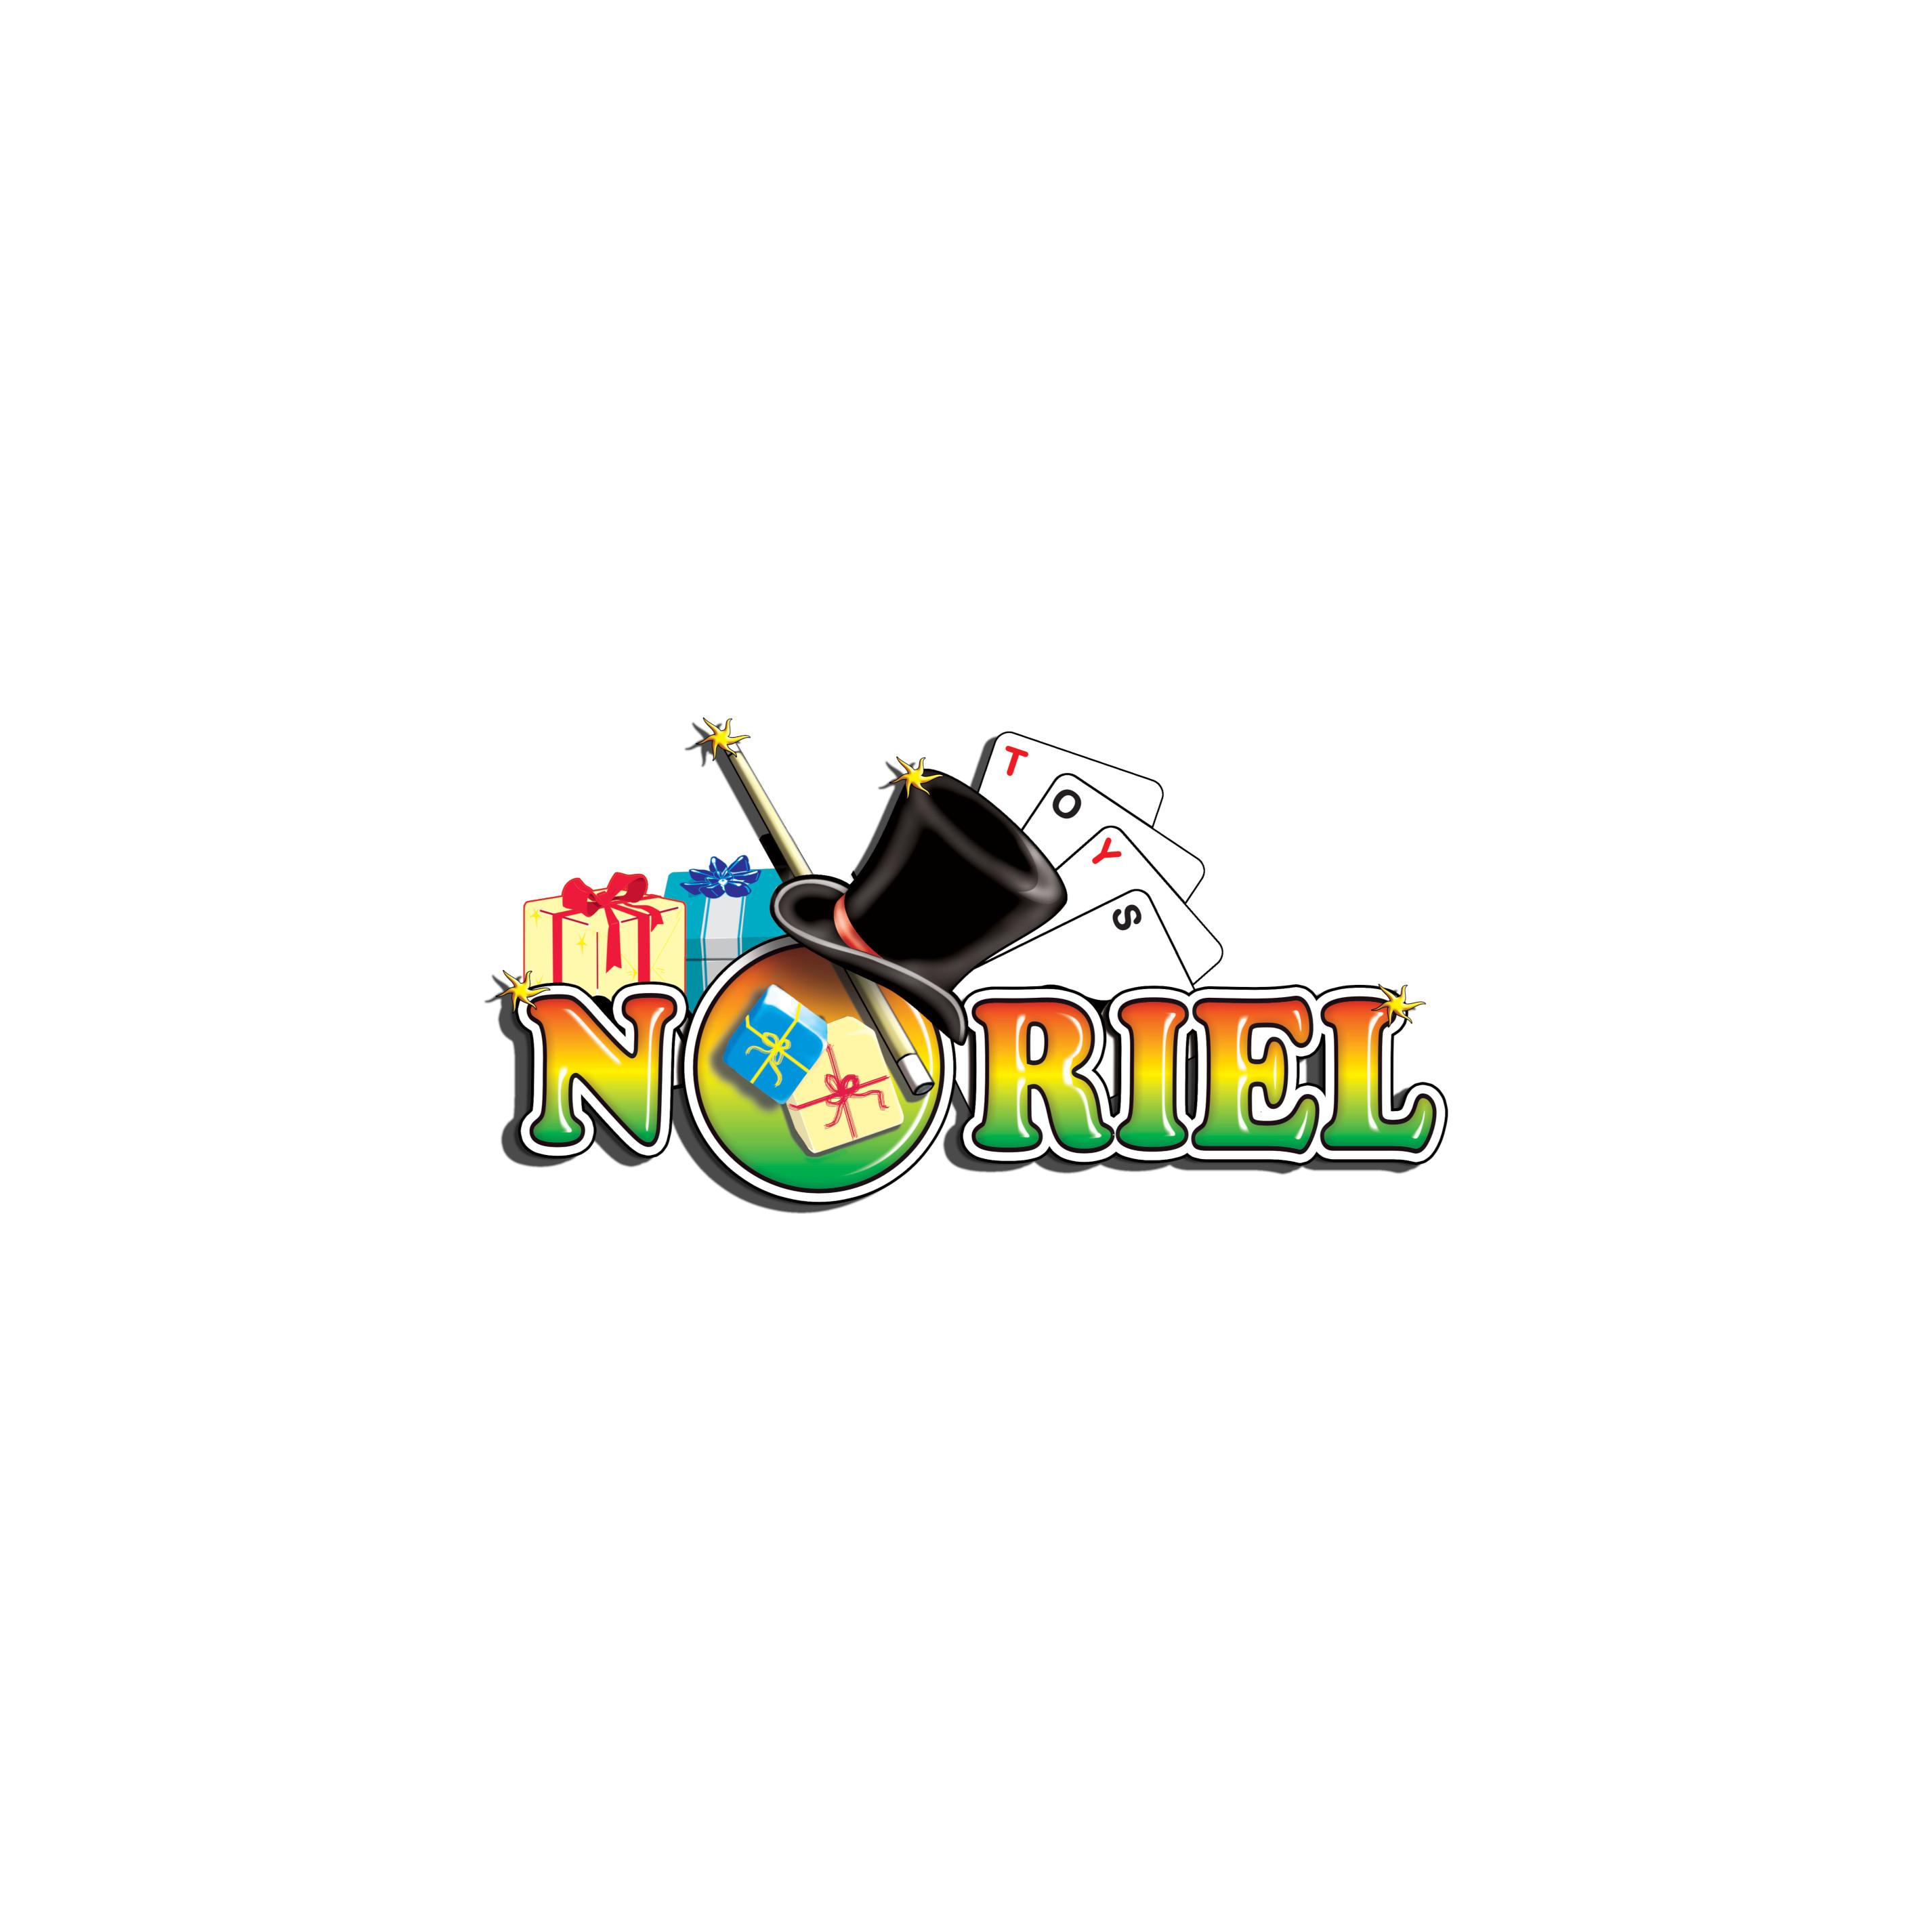 Baloane de umflat Oonies Starry Pets Theme Pack S4 19958